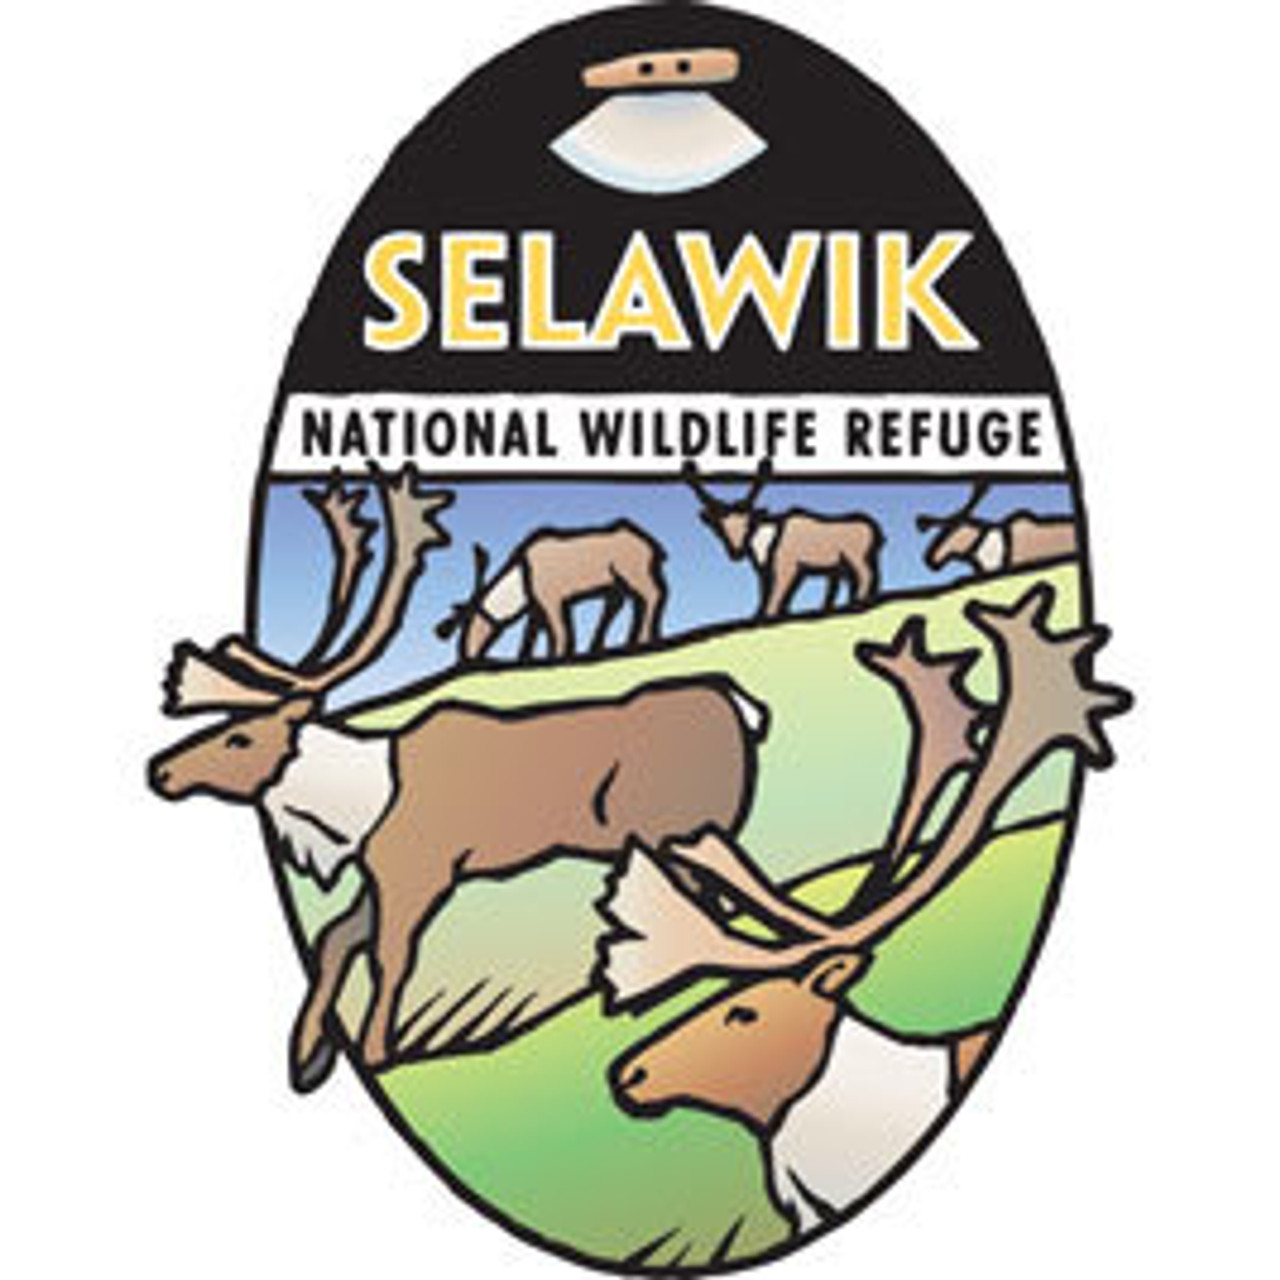 Selawik National Wildlife Refuge